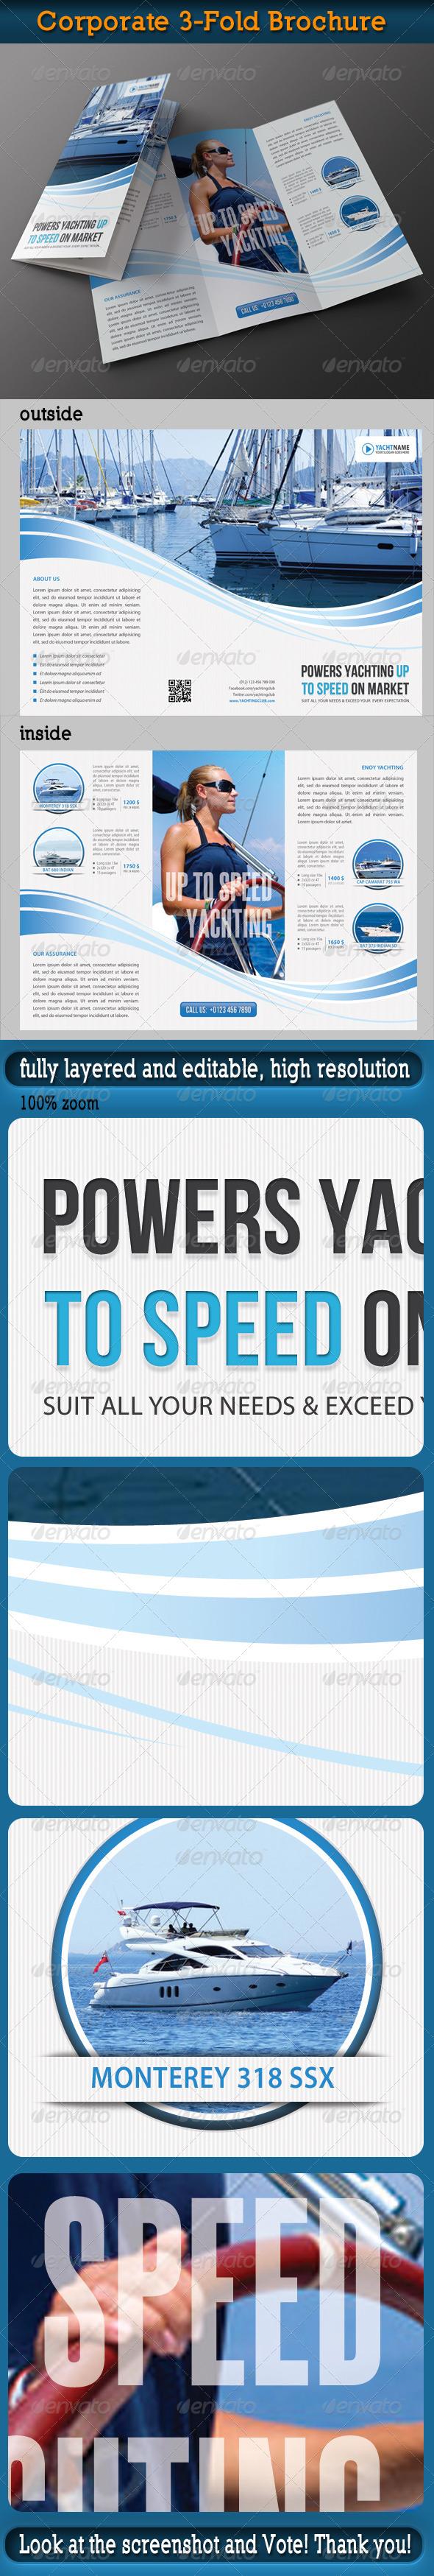 Corporate 3-Fold Brochure 24 - Informational Brochures